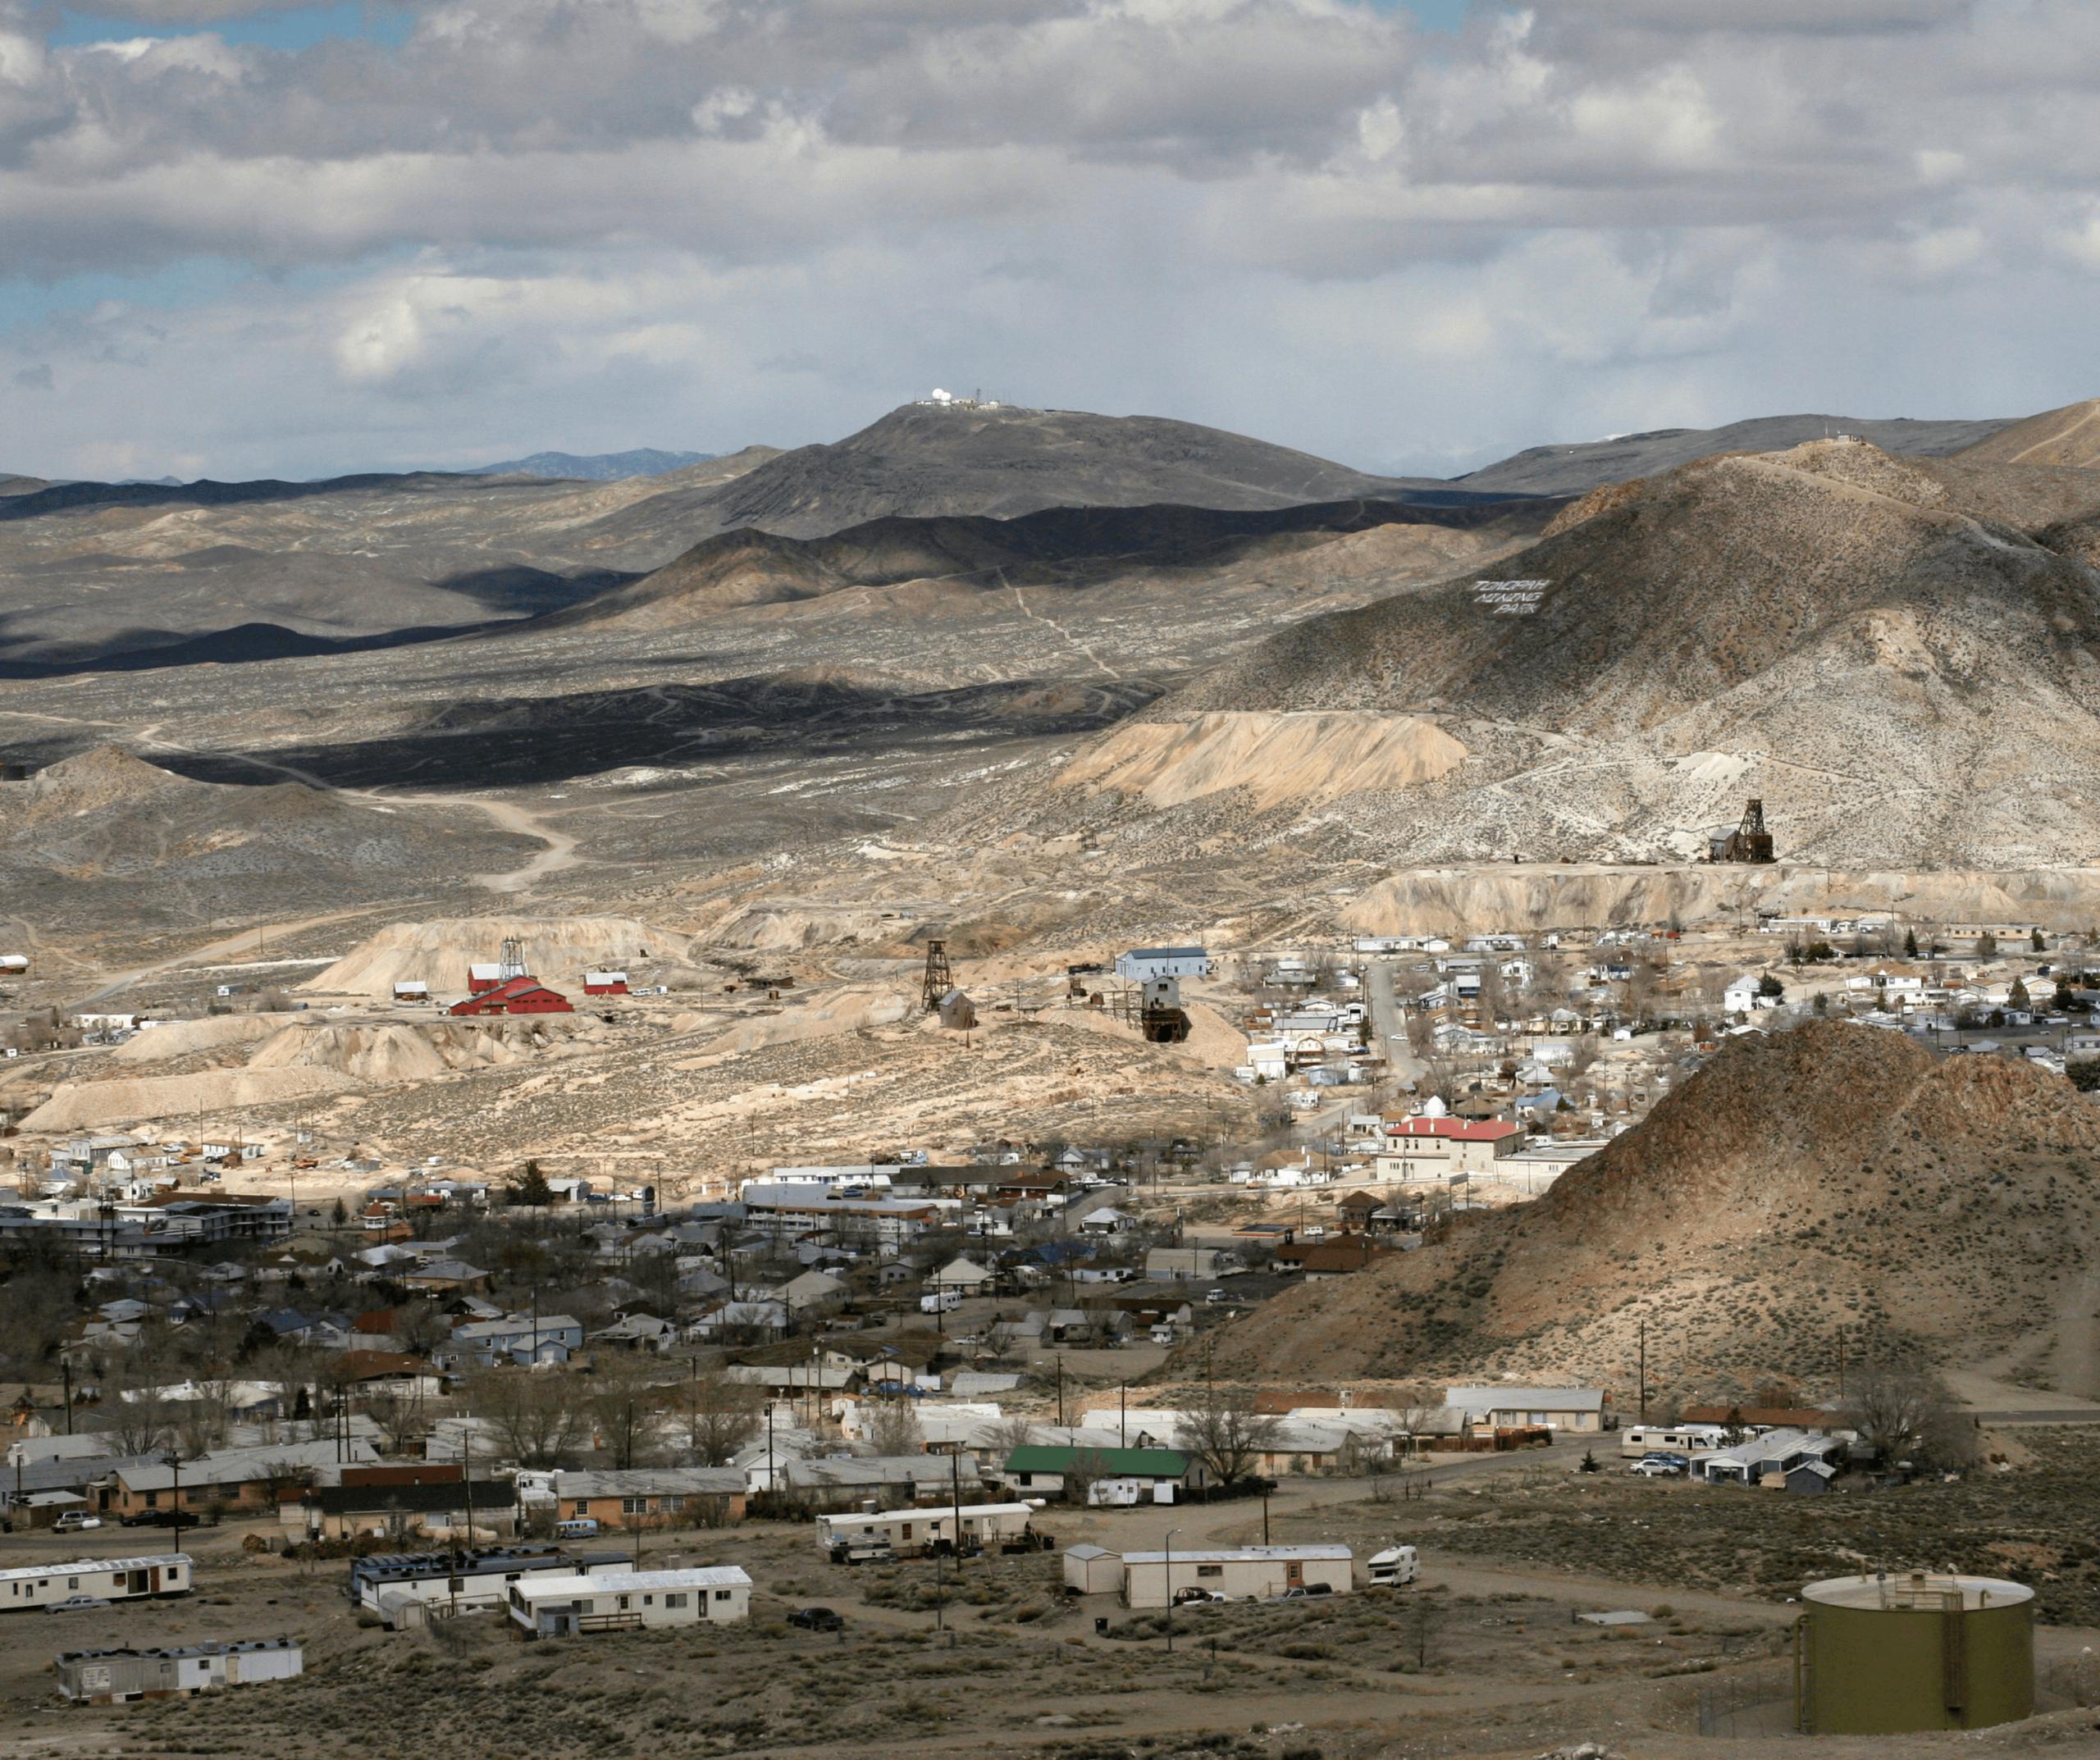 Things to do in Tonopah Nevada